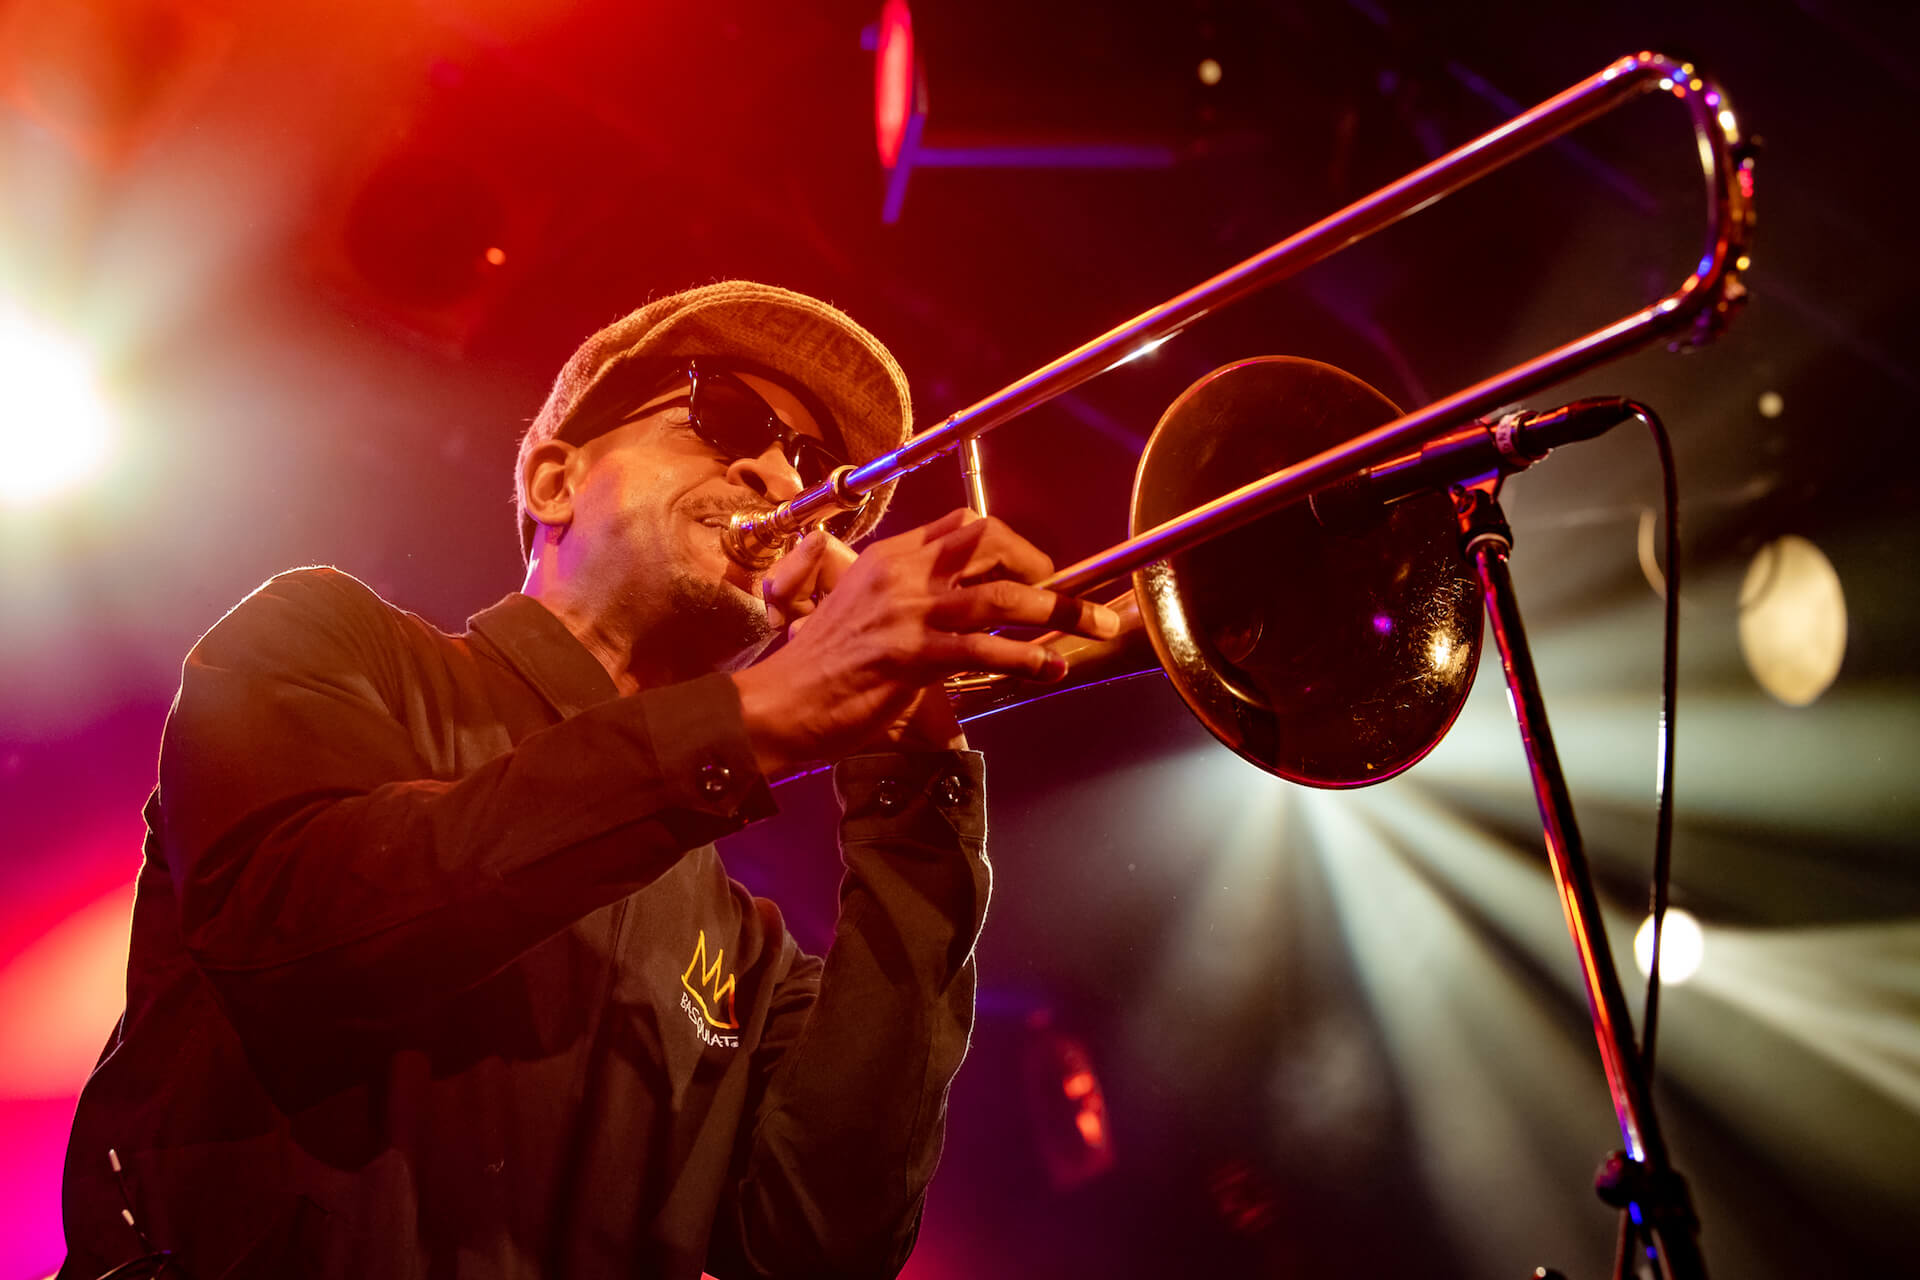 Kamasi Washington ライブレポート|「ブラック・エンターテインメント」の伝統を今に受け継ぐ見事なショウ music190903-kamasiwashington-9